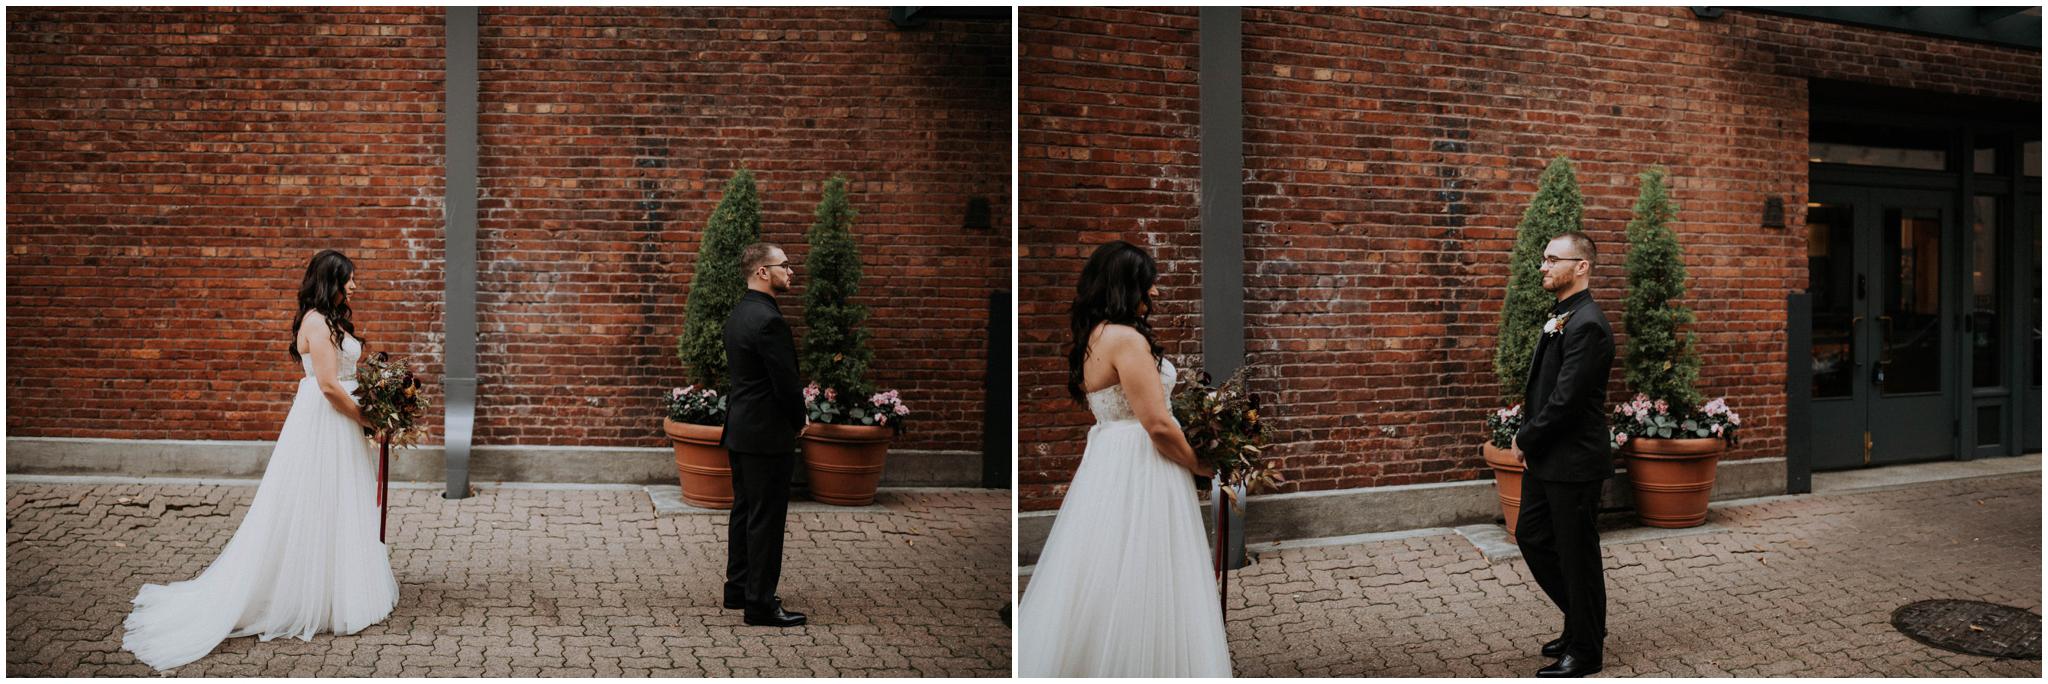 danny+mackenzie+downtown-seattle-axis-wedding-seattle-photographer-028.jpg